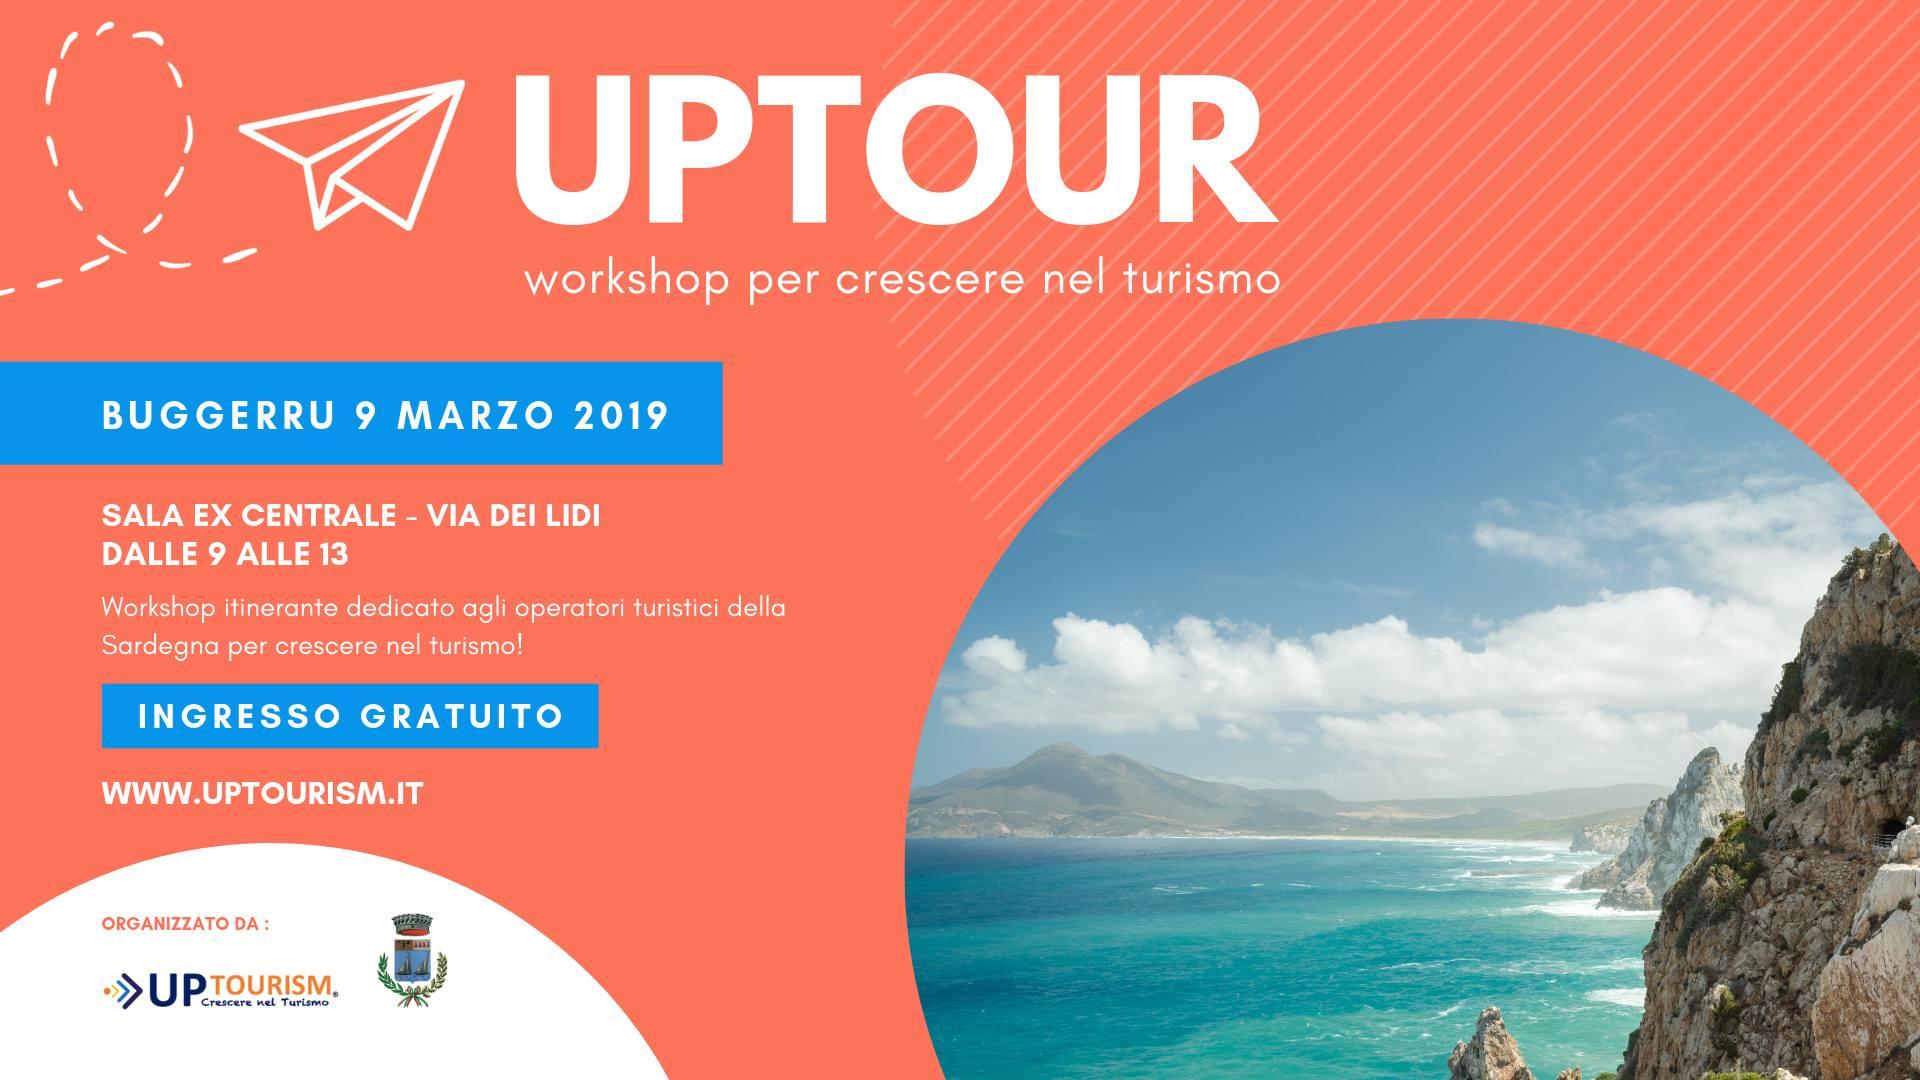 Uptour-workshop-turismo-buggerru-sardegna